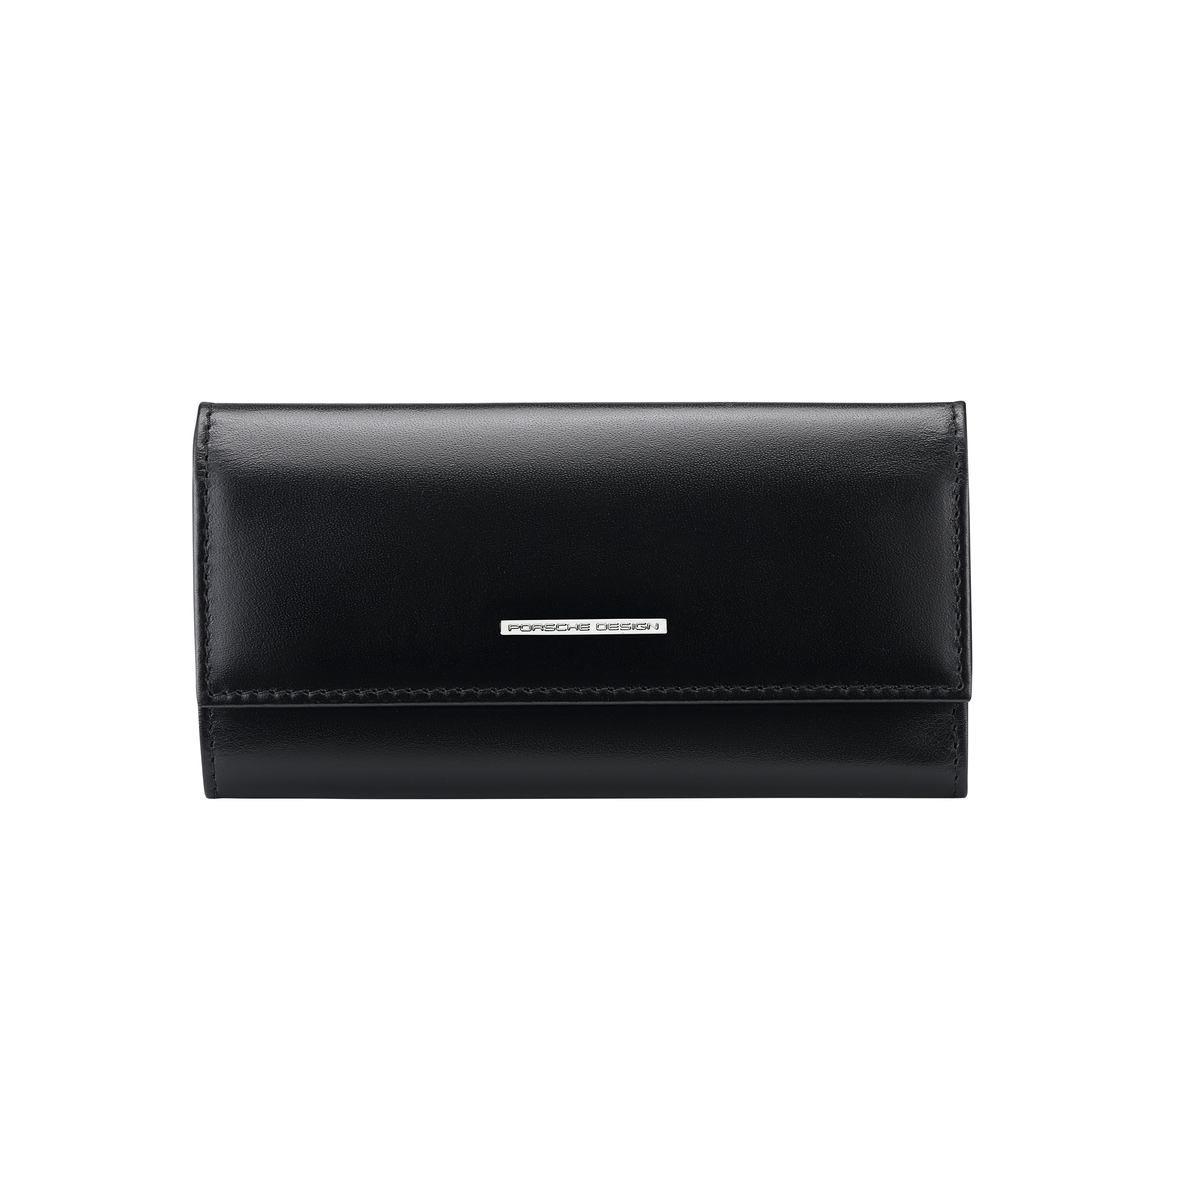 Porsche Design κλειδοθήκη δερμάτινη 13x7cm σειρά Classic Key Case L Black